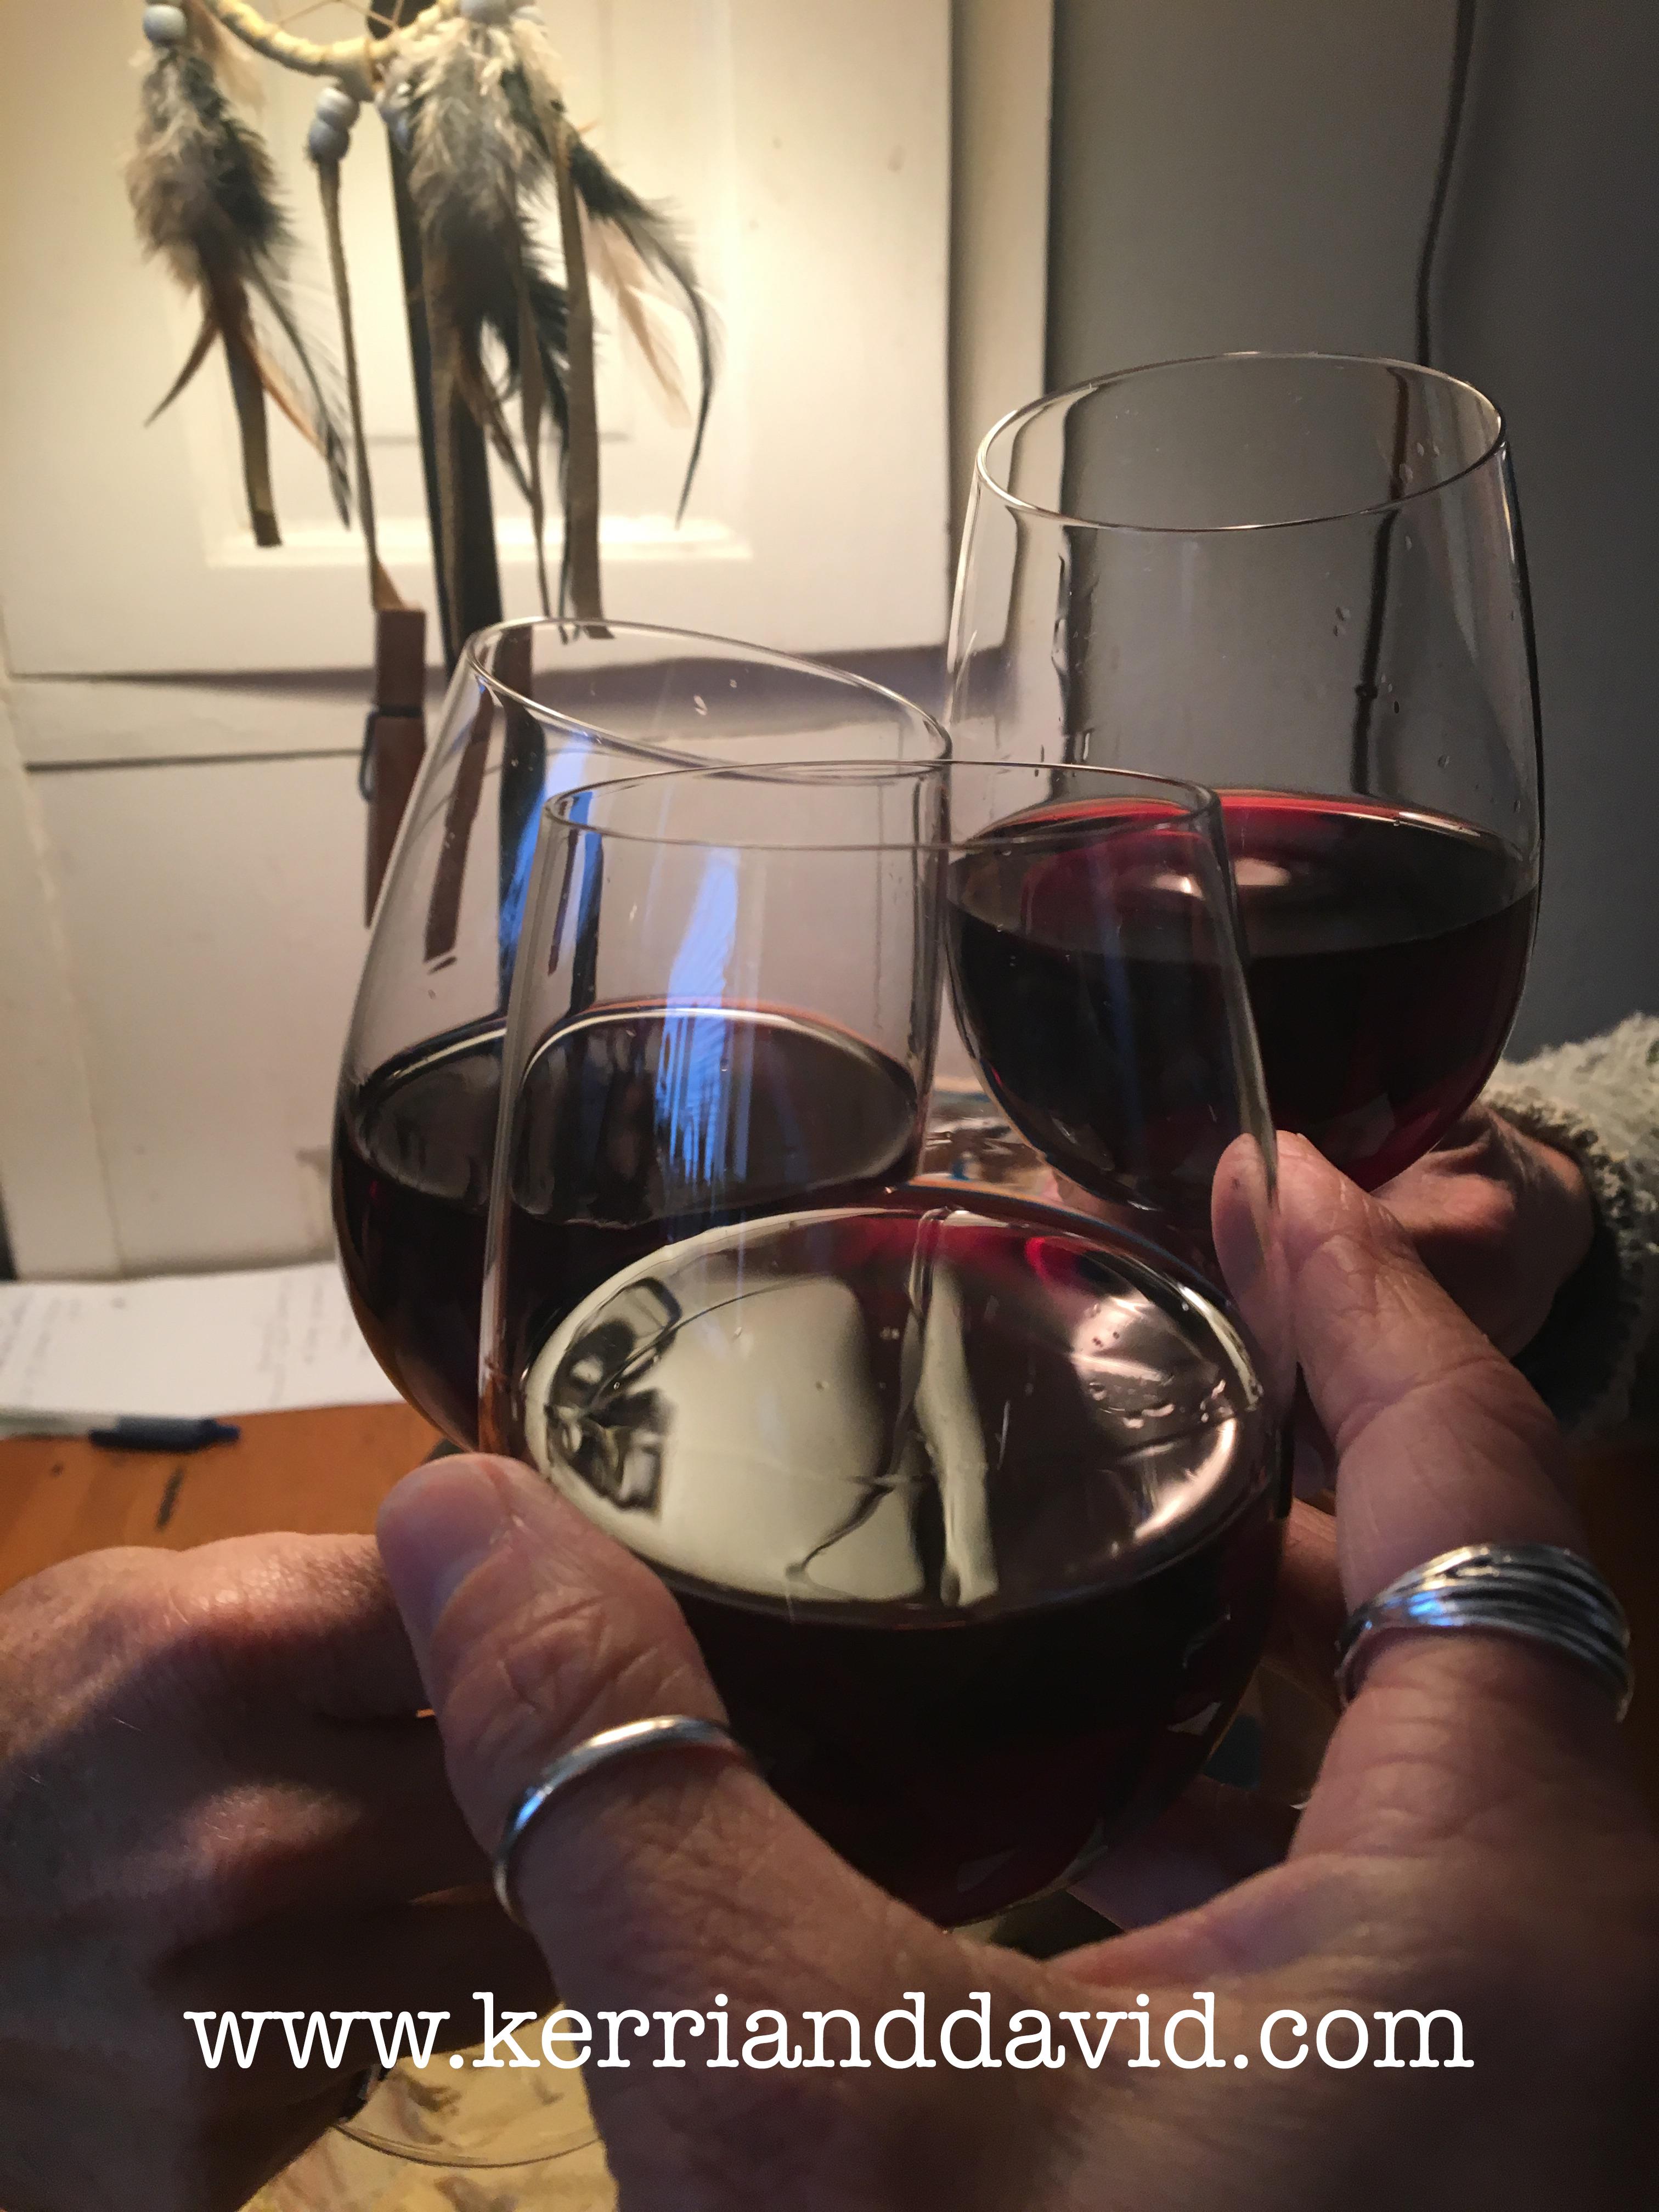 wineglassesthreehands61 website box